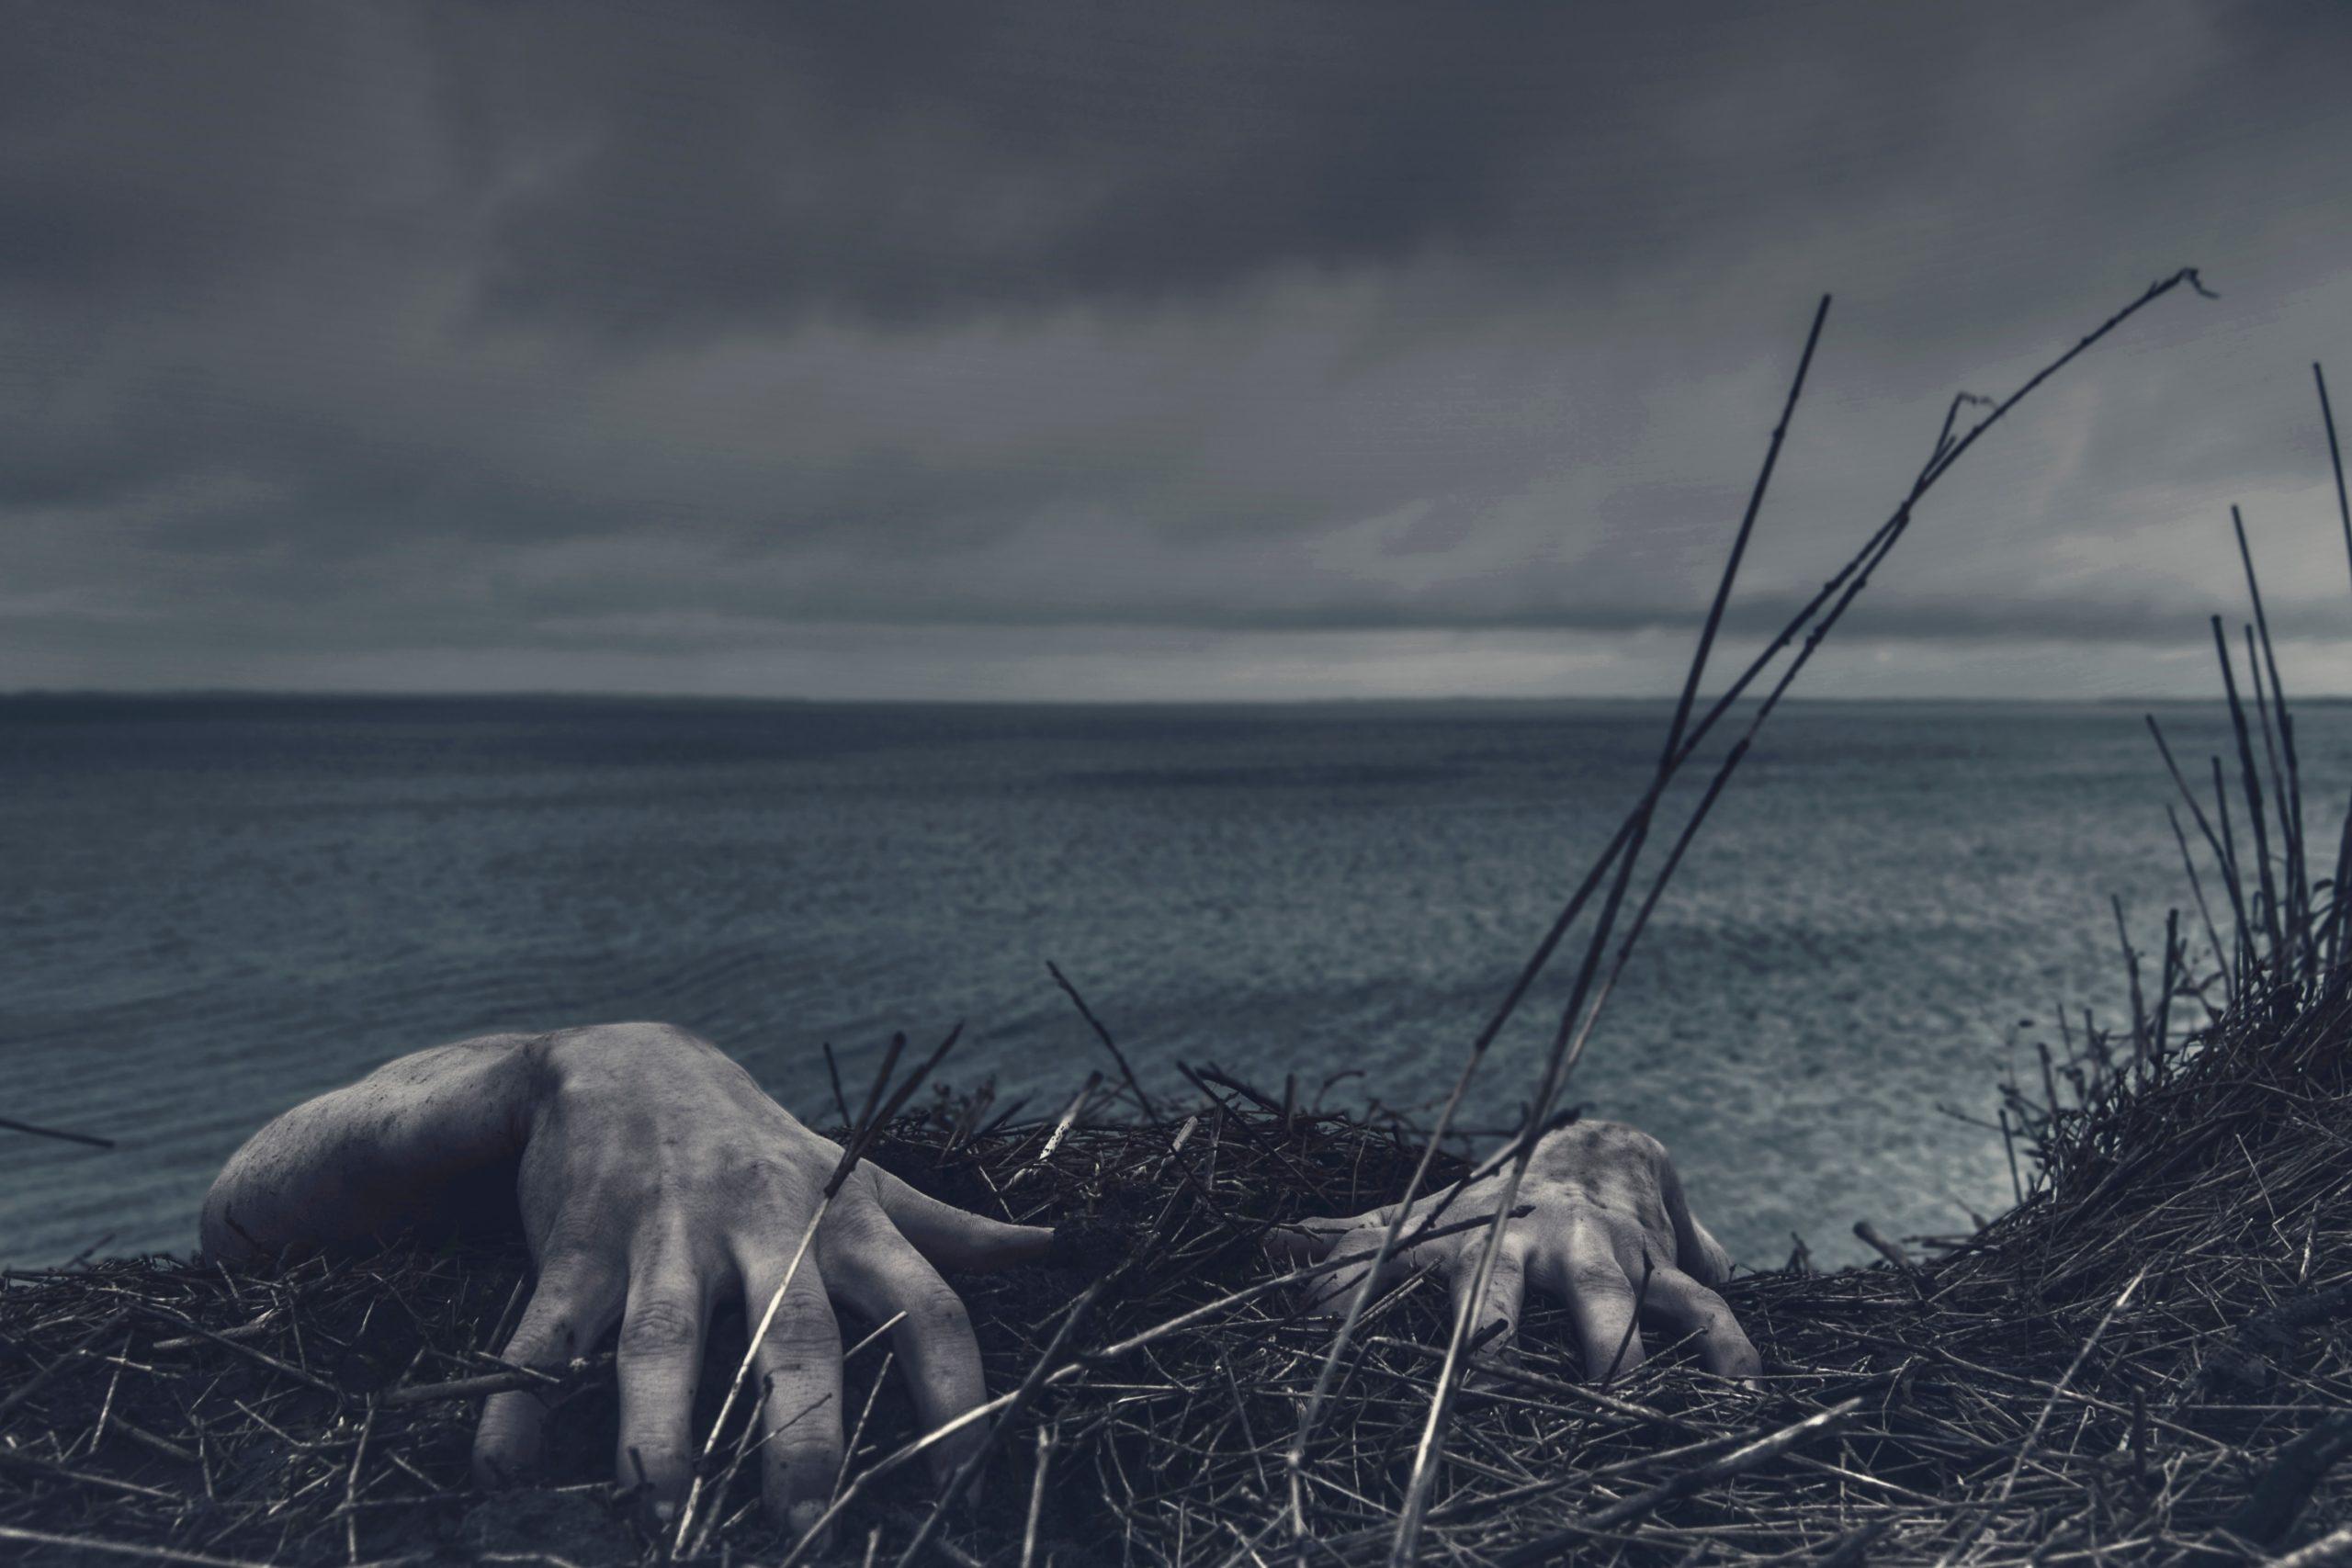 """Undead"" Photo by Daniel Jensen on Unsplash"